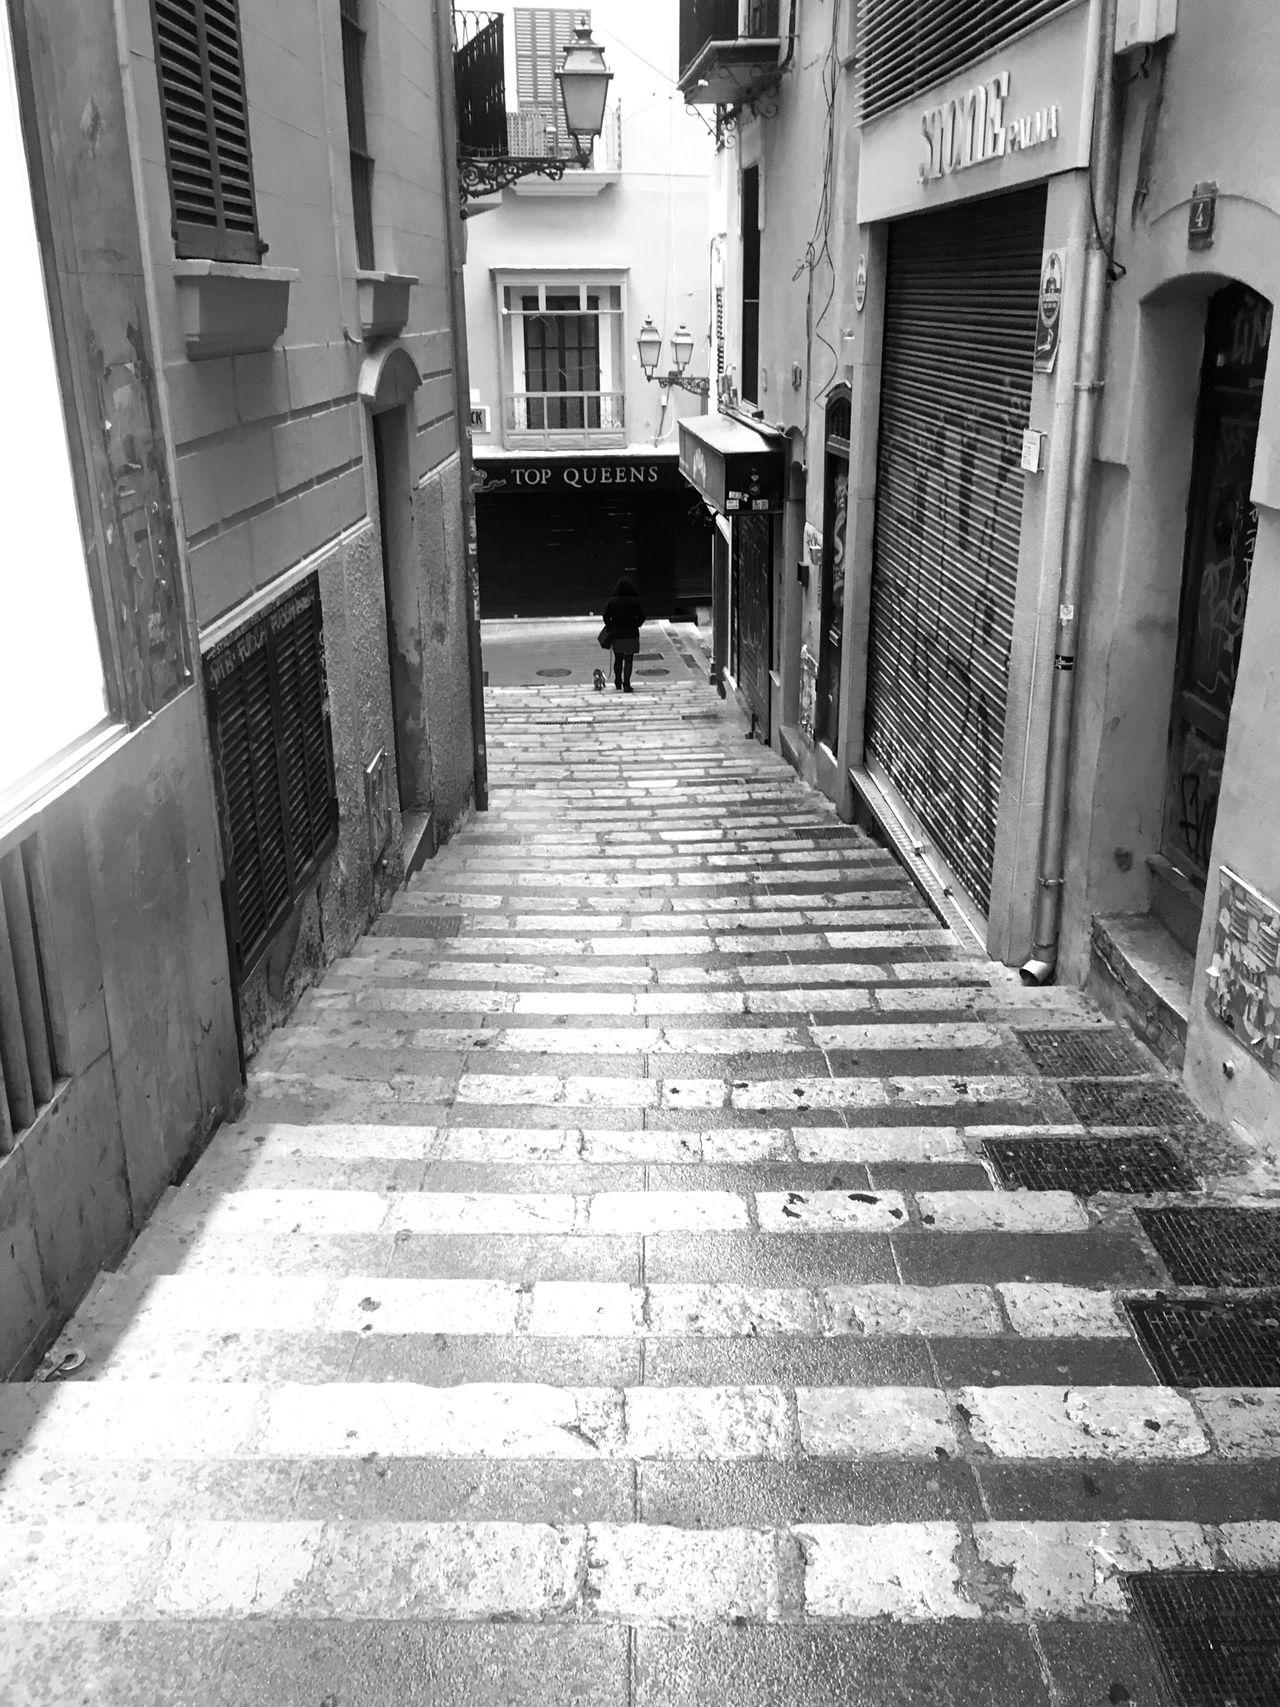 Blackandwhite Black And White Black & White Blackandwhite Photography Black And White Photography Black&white Architecture Architecture_collection Stair Stairways Stairway Stairs_collection Best Of Stairways Palma De Mallorca Mallorca Mallorcaphotographer